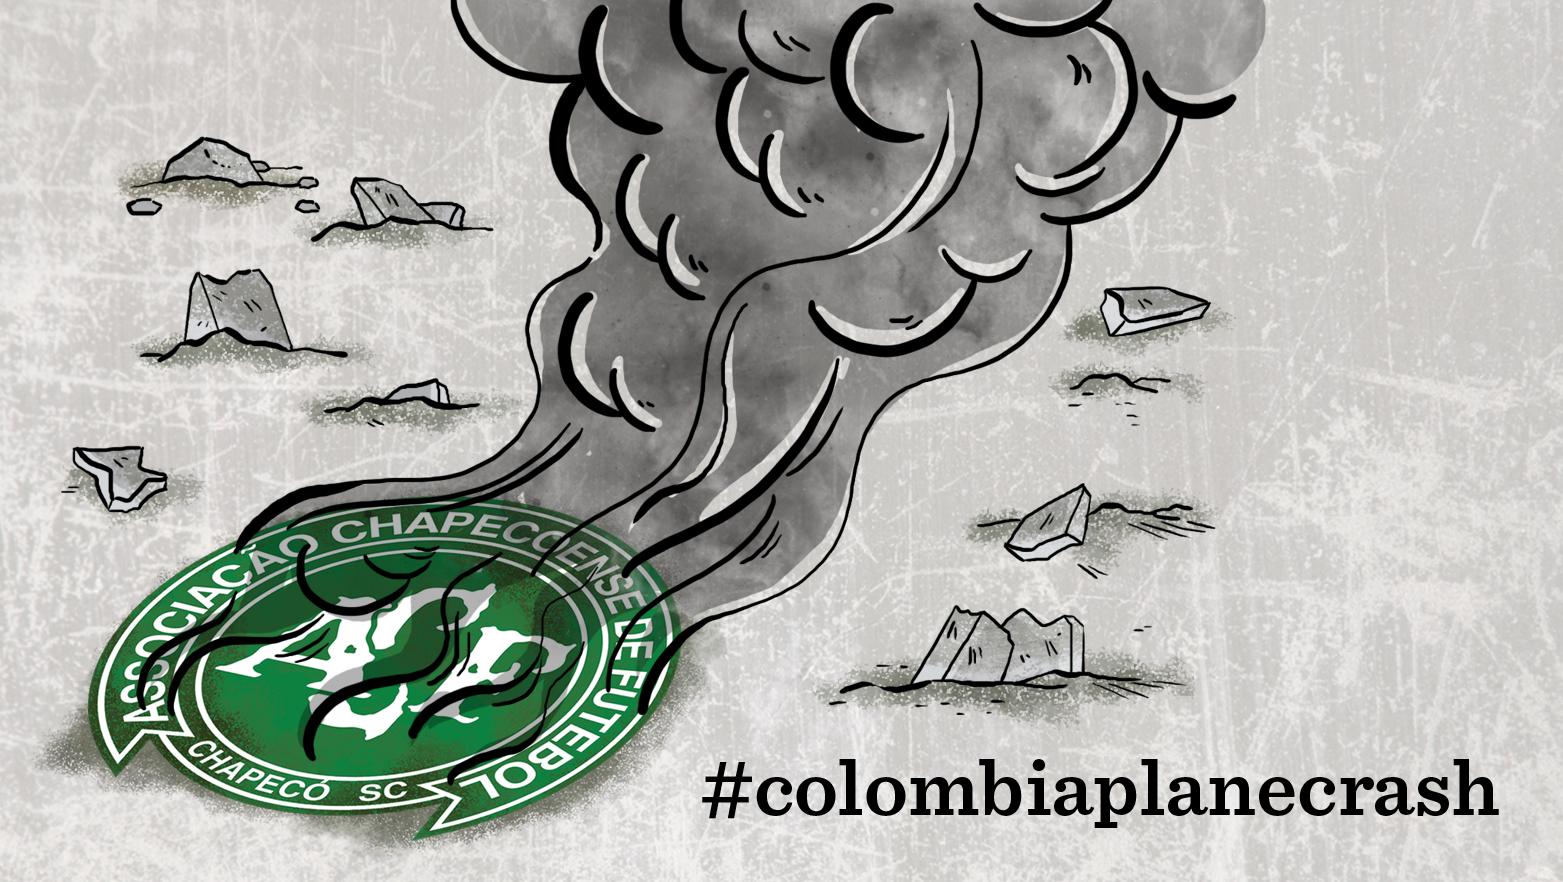 Brazilian football team in Colombia plane crash